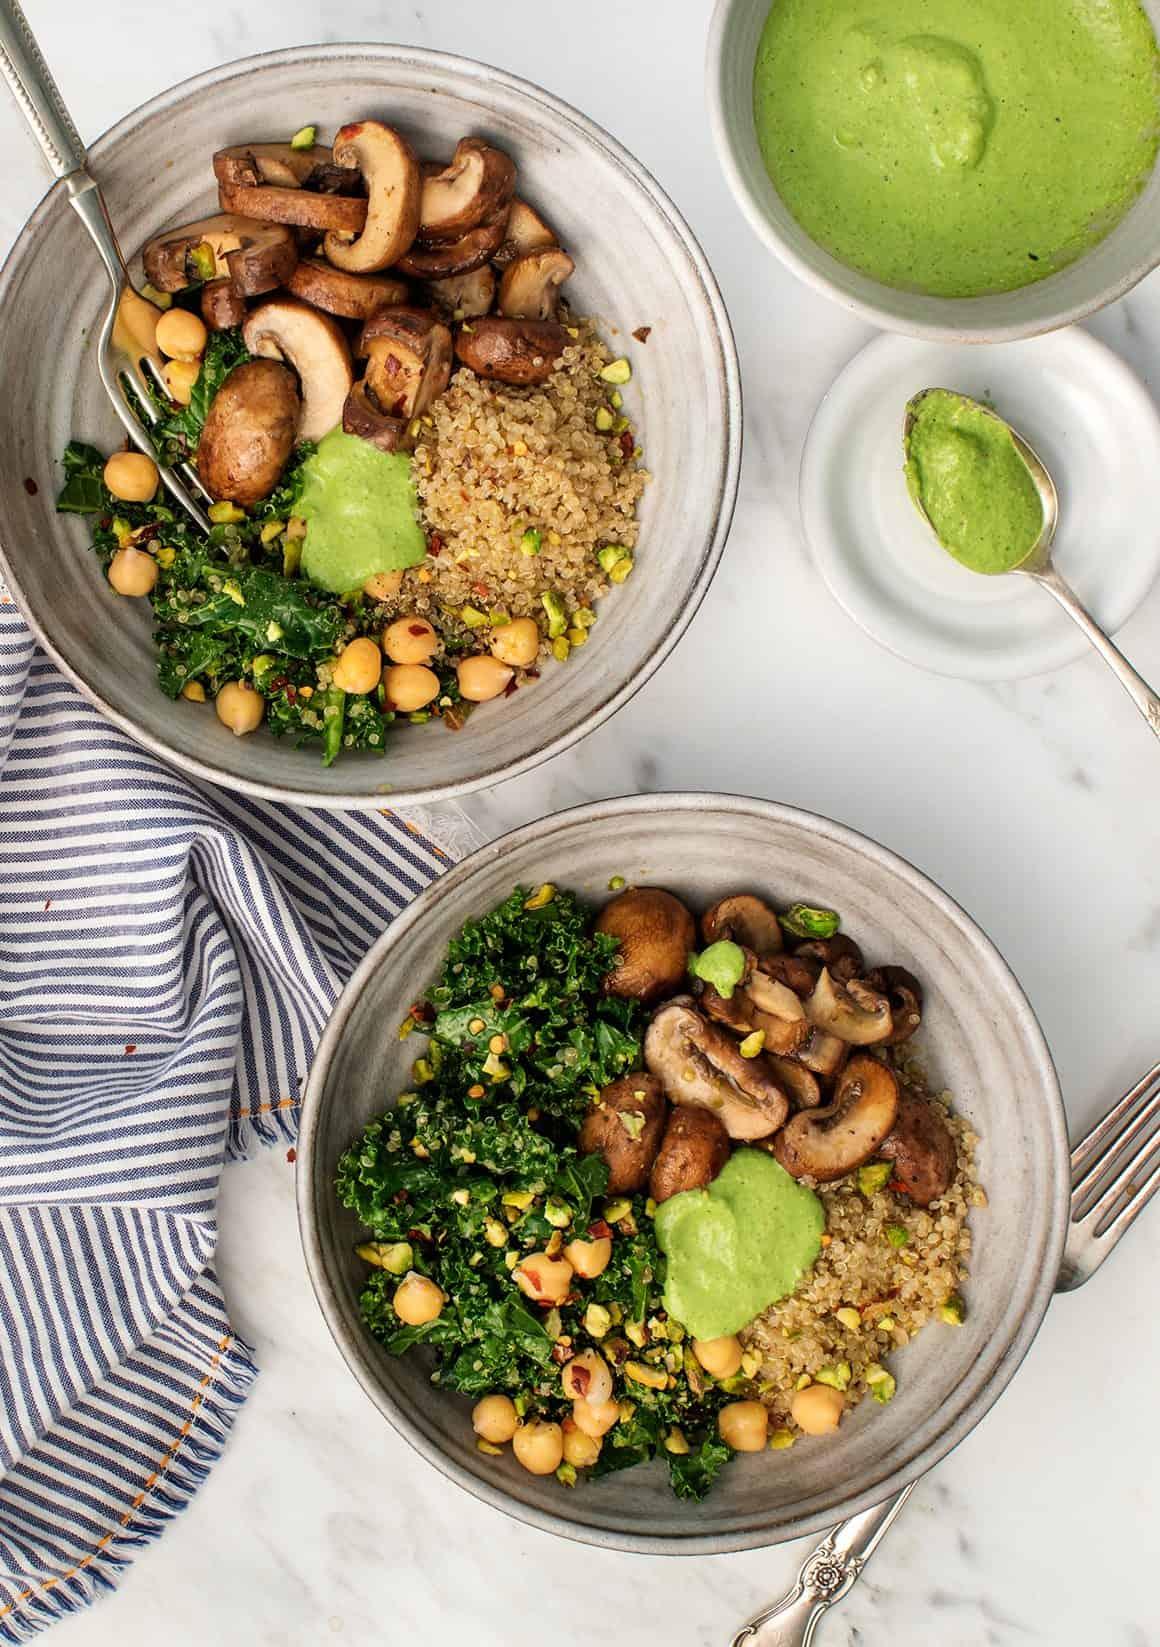 Kale Pesto Mushroom Pistachio Bowls